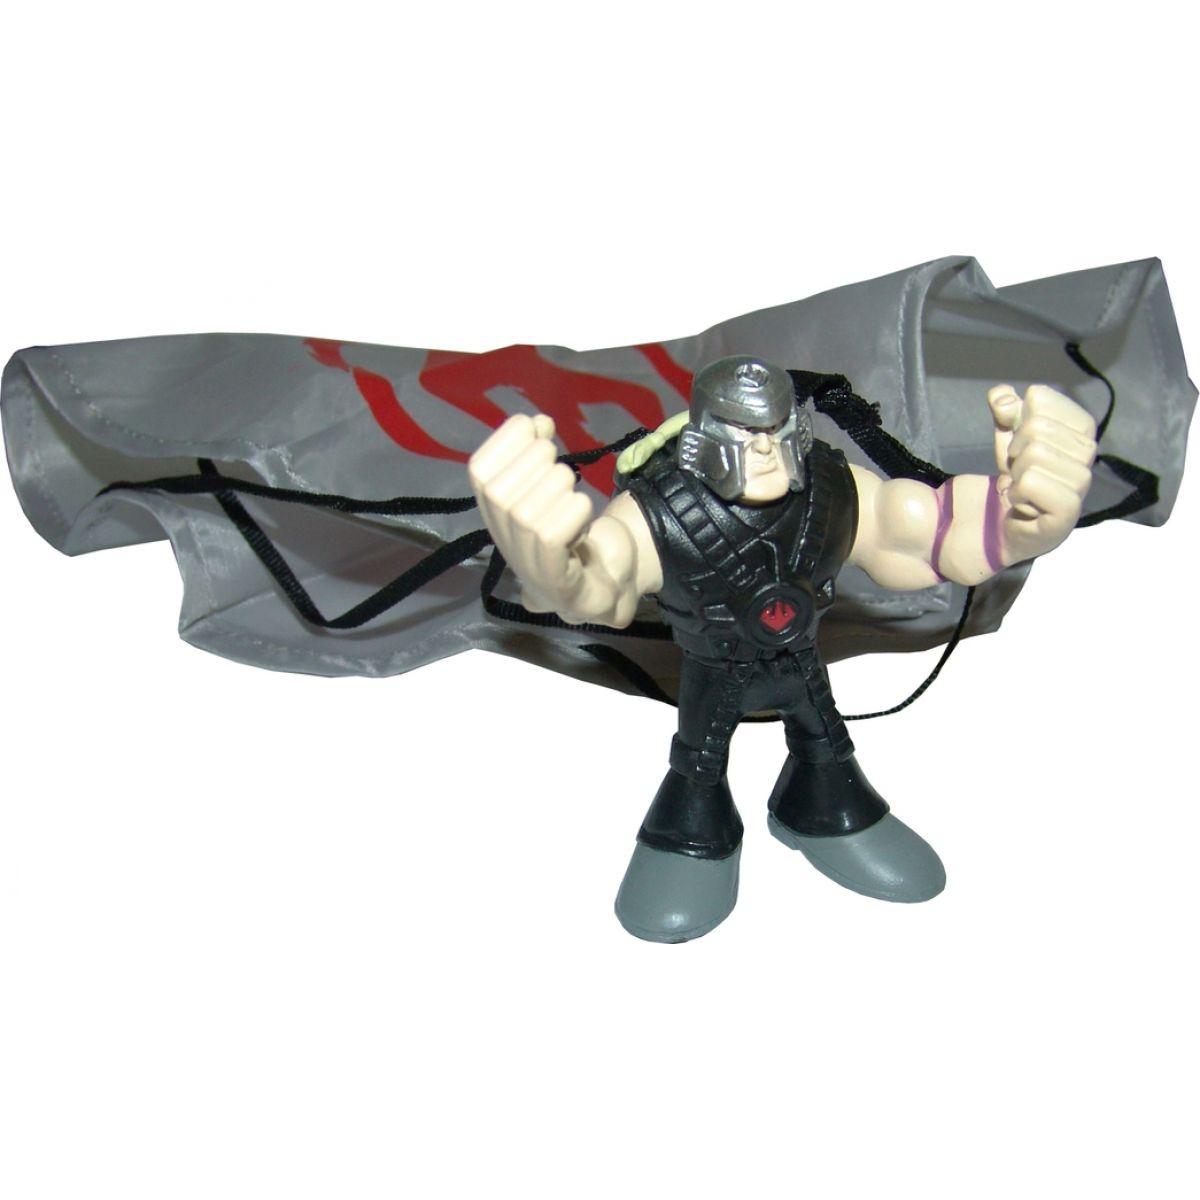 EP Line Želvy Ninja TMNT mini mutants sada s padákem a figurkou